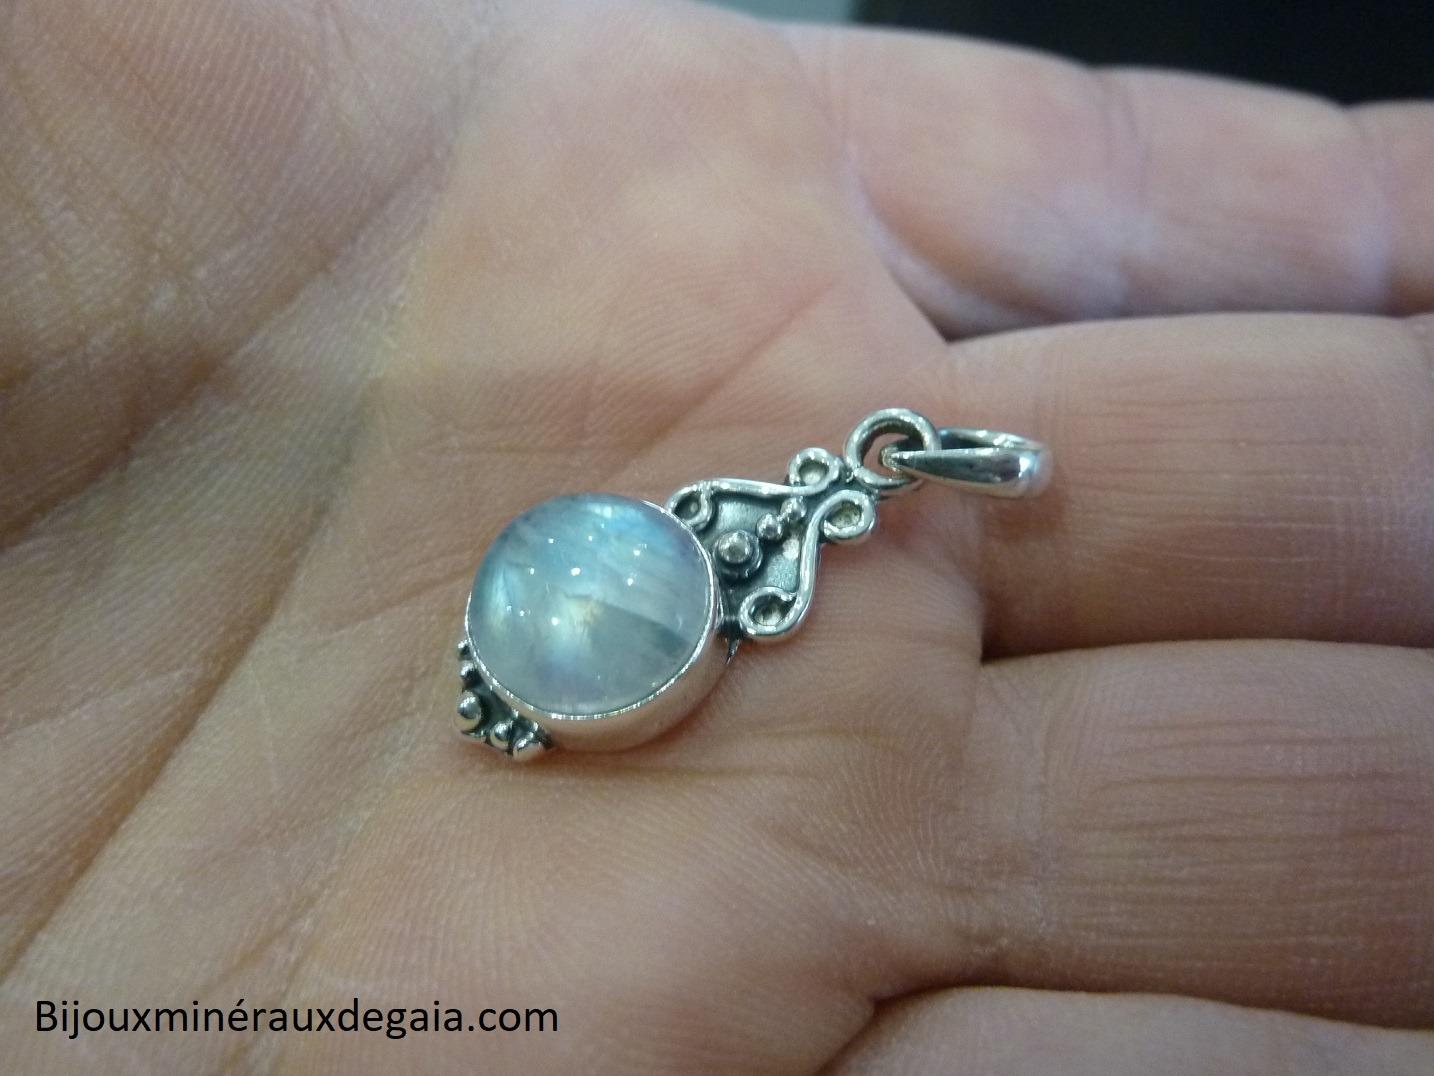 Pendentif Pierre de lune Monture argent 925 Ref 5840